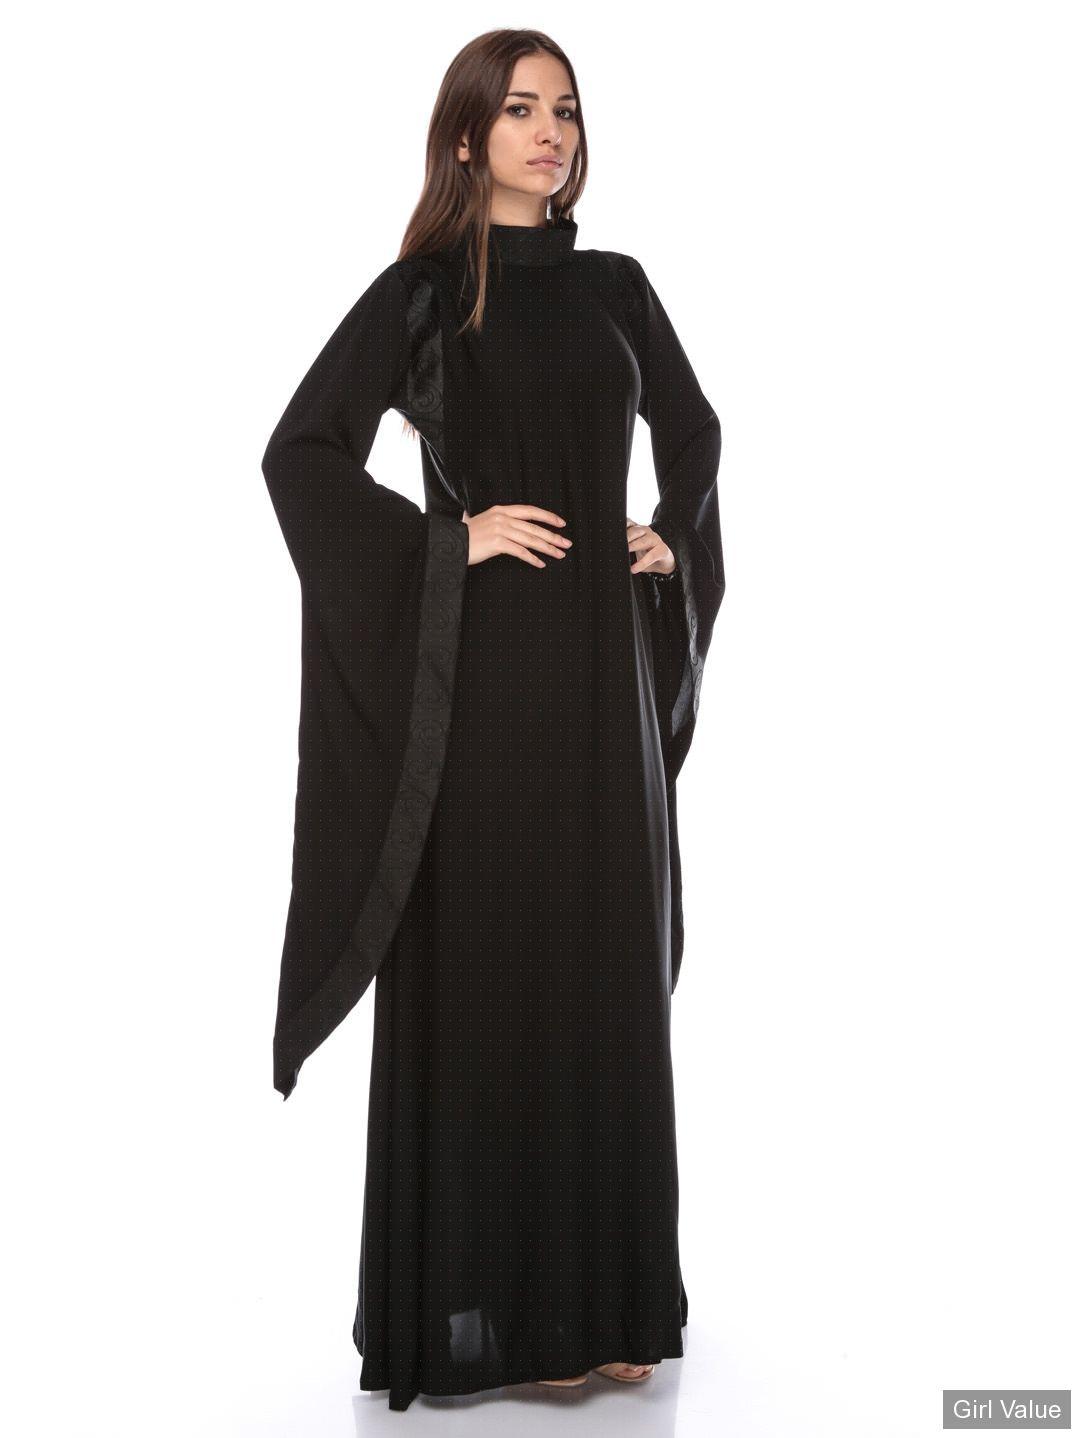 76790710ac3 Arab Girl in Black Arabic Kaftan Dress | Arabian Girl Photos ...